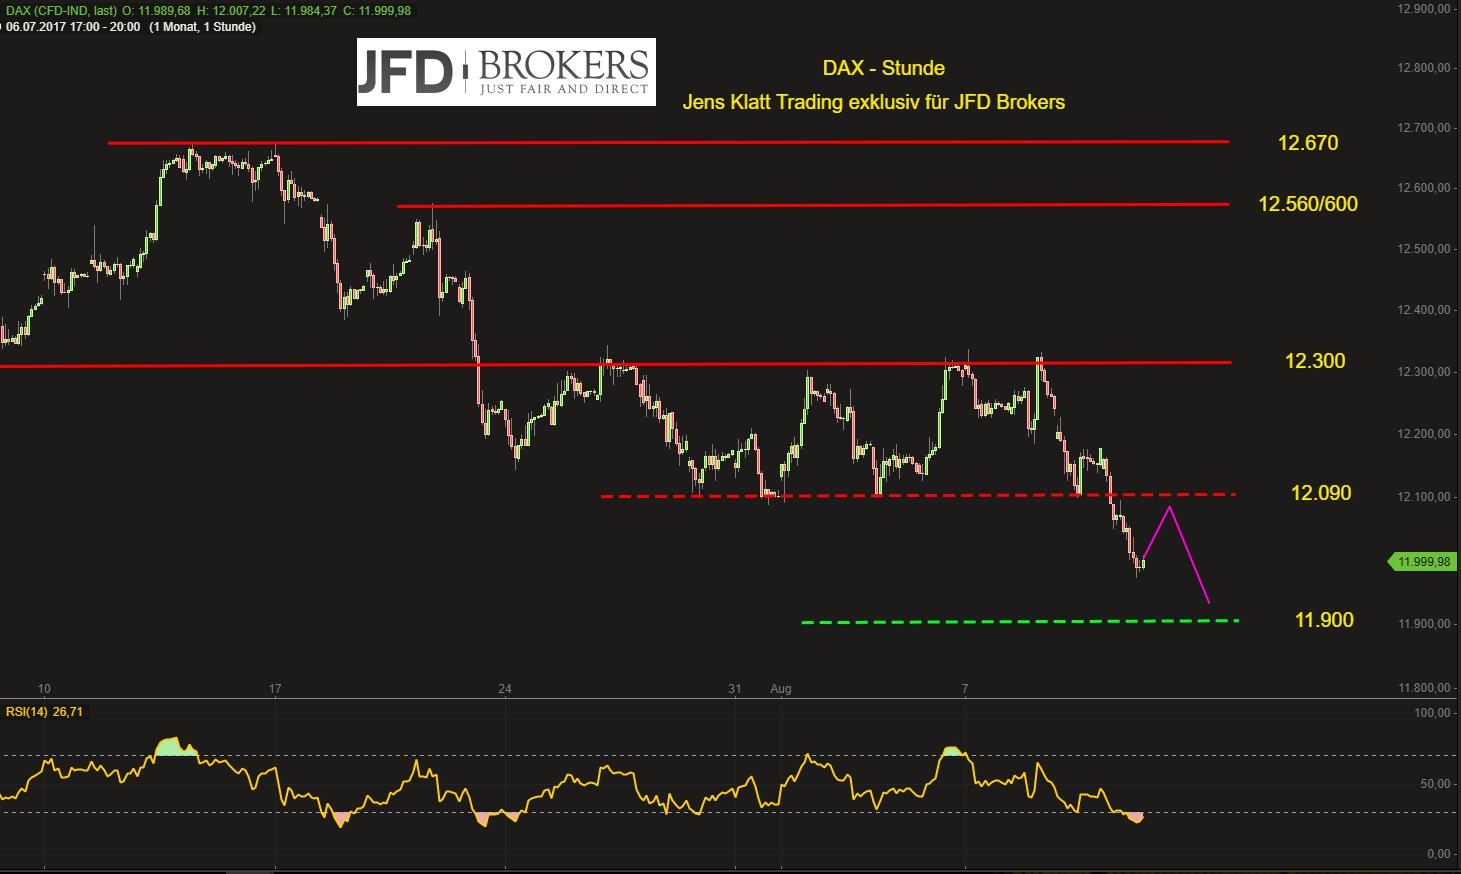 DAX-fällt-unter-12-100er-Marke-unter-12-000-aus-der-Handelswoche-Kommentar-JFD-Brokers-GodmodeTrader.de-2